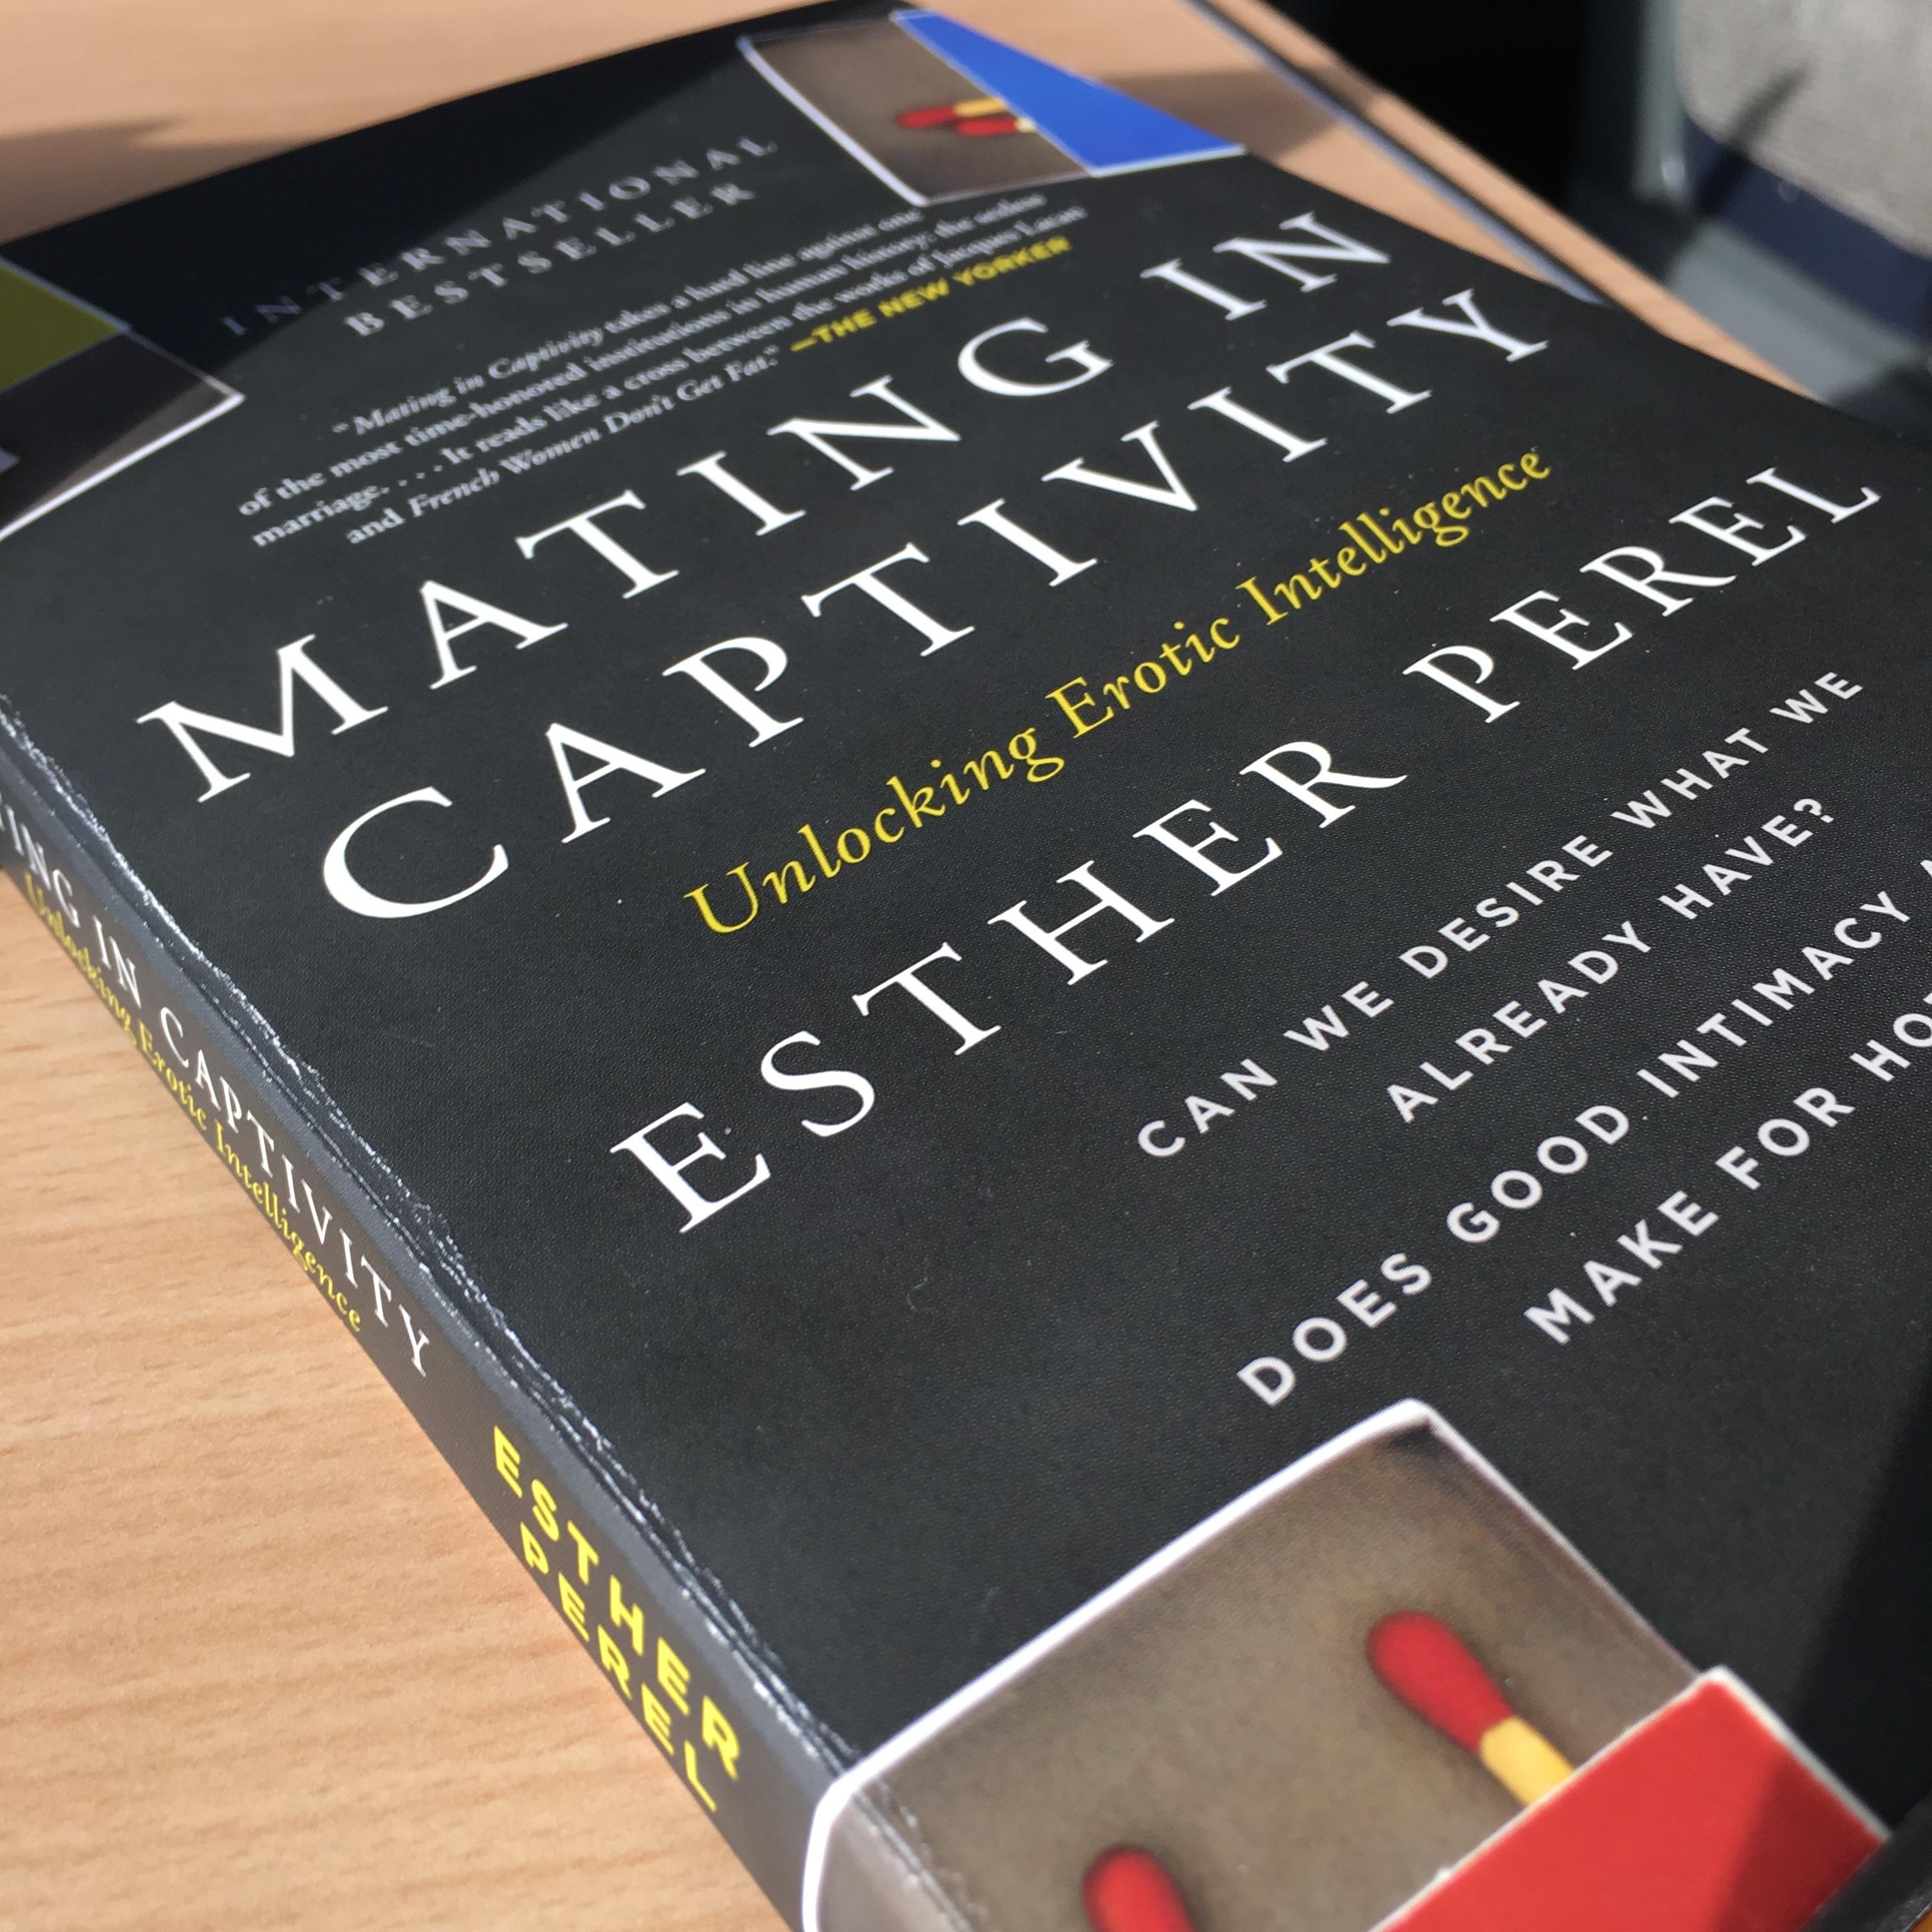 Mating in captivity: Unlocking Erotic Intelligence (book 6 of 26)